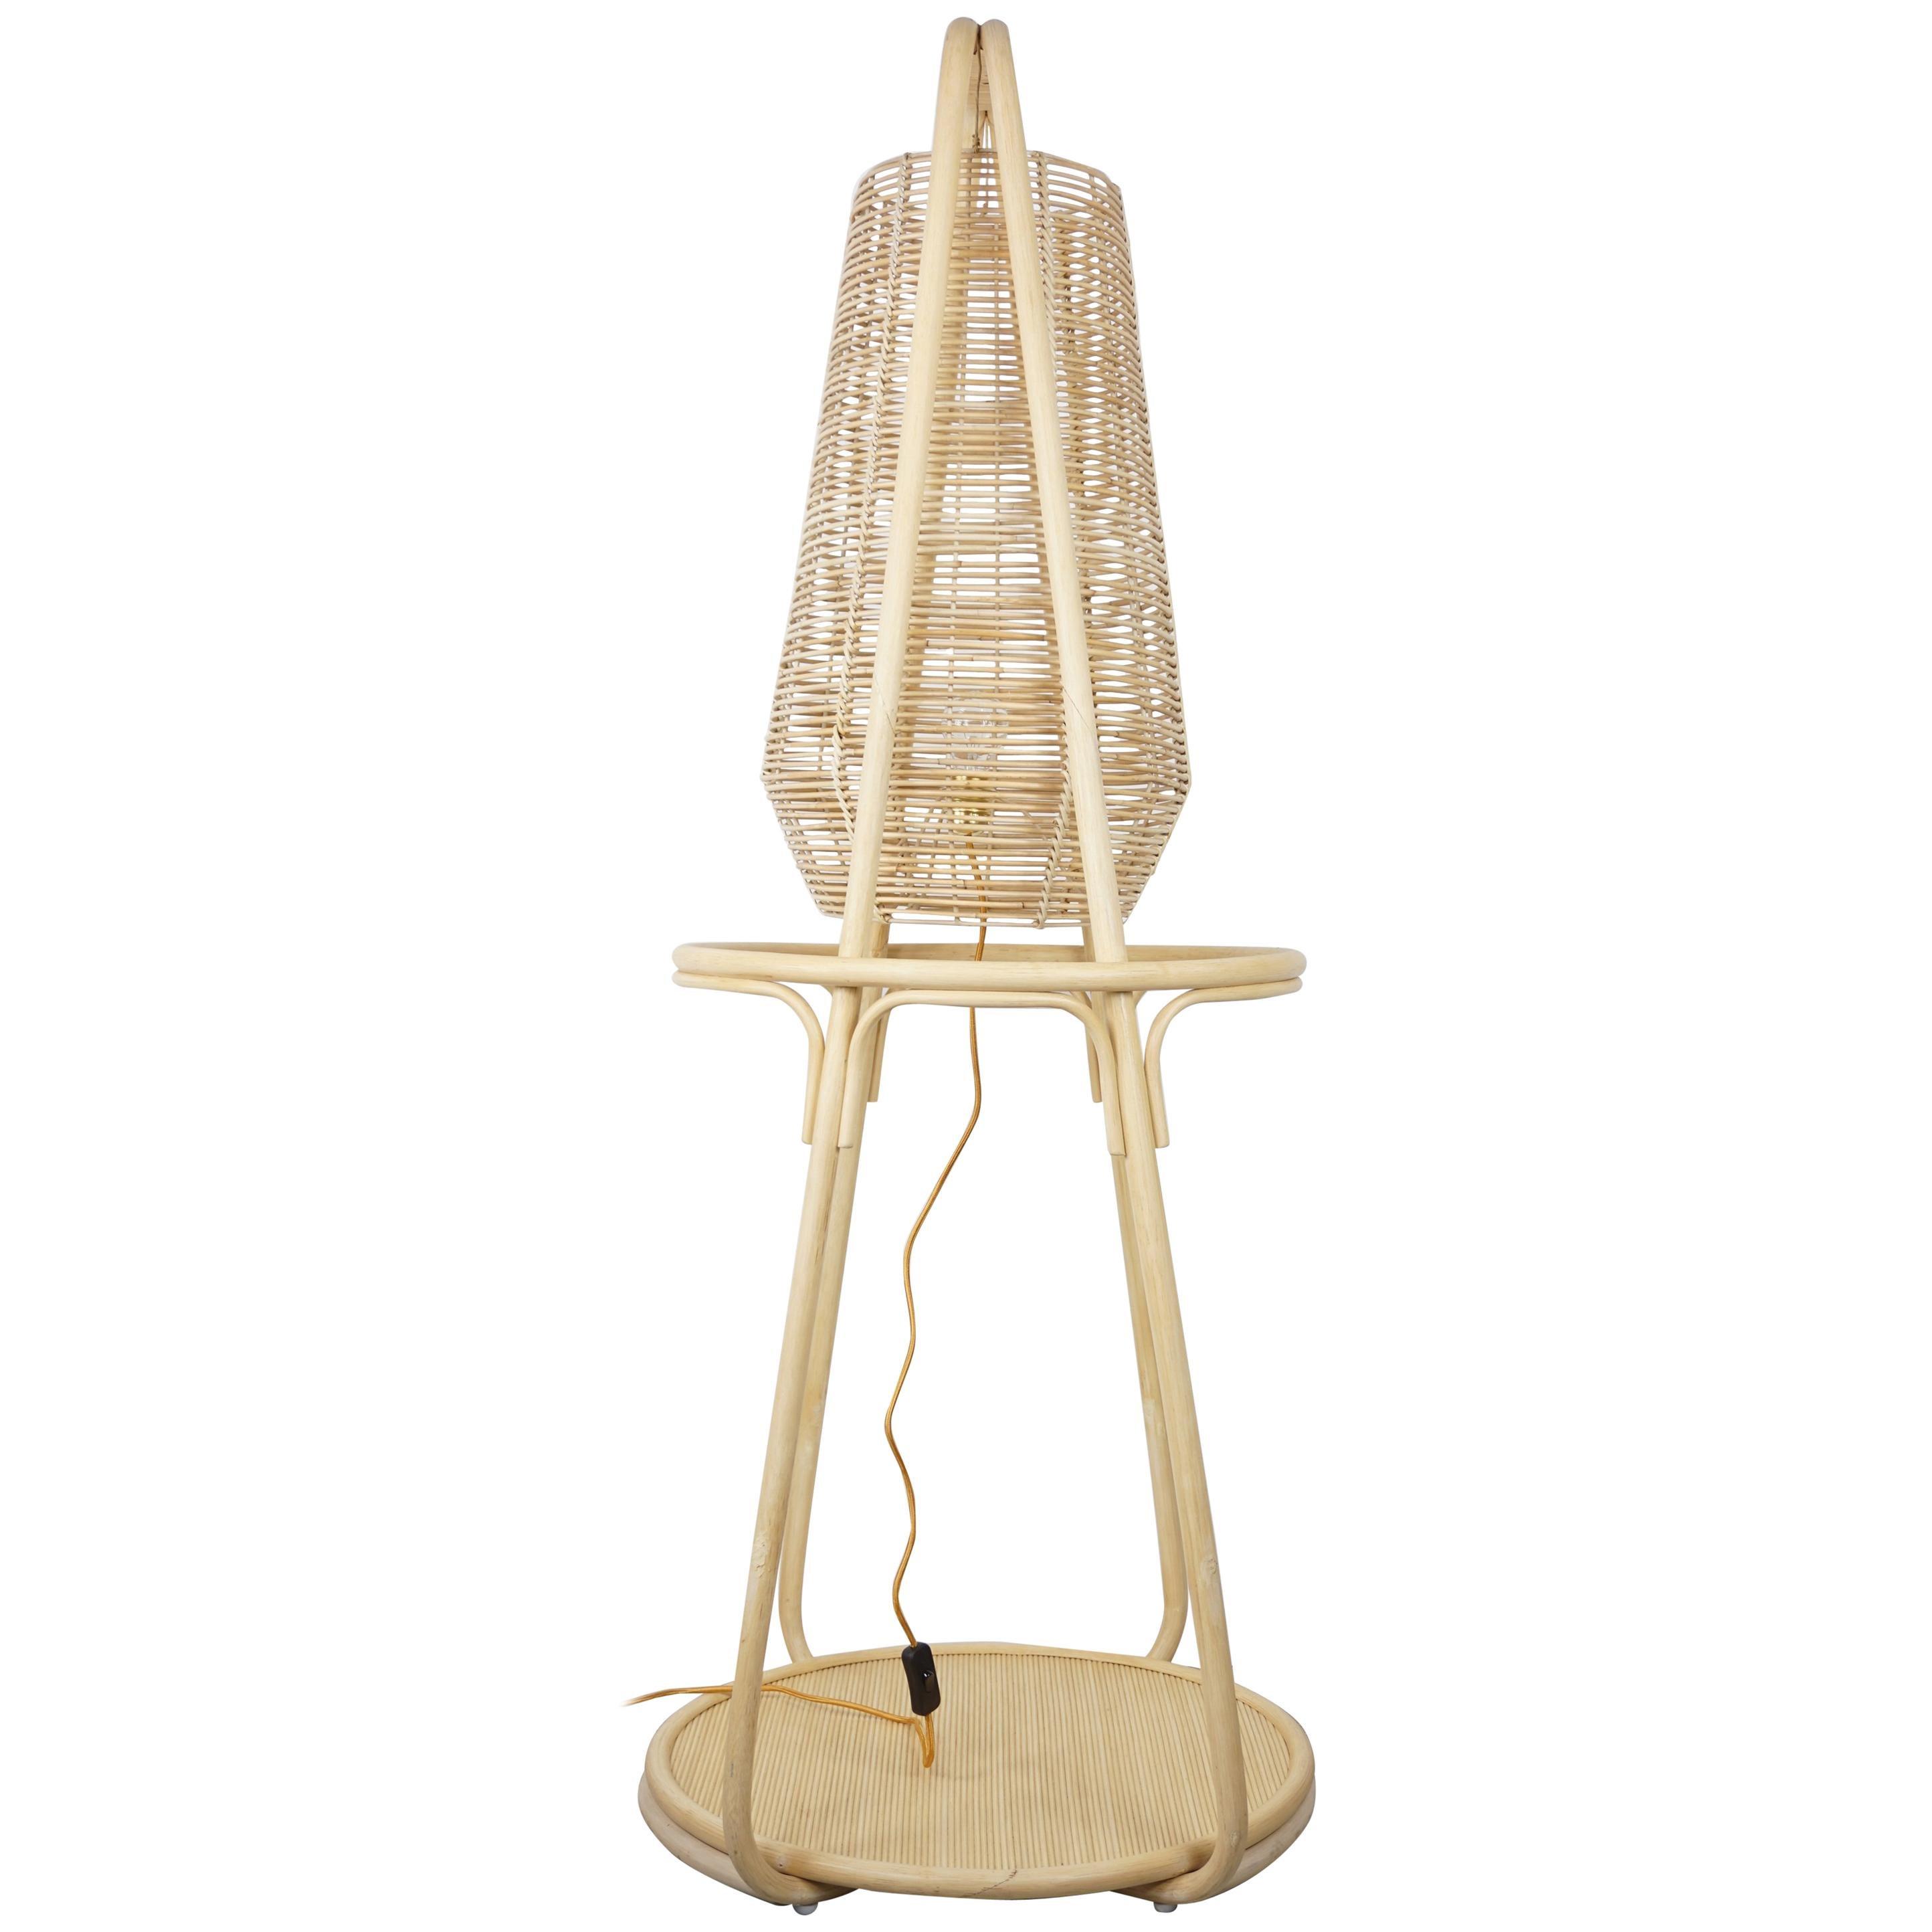 French Design Rattan Floor Lamp